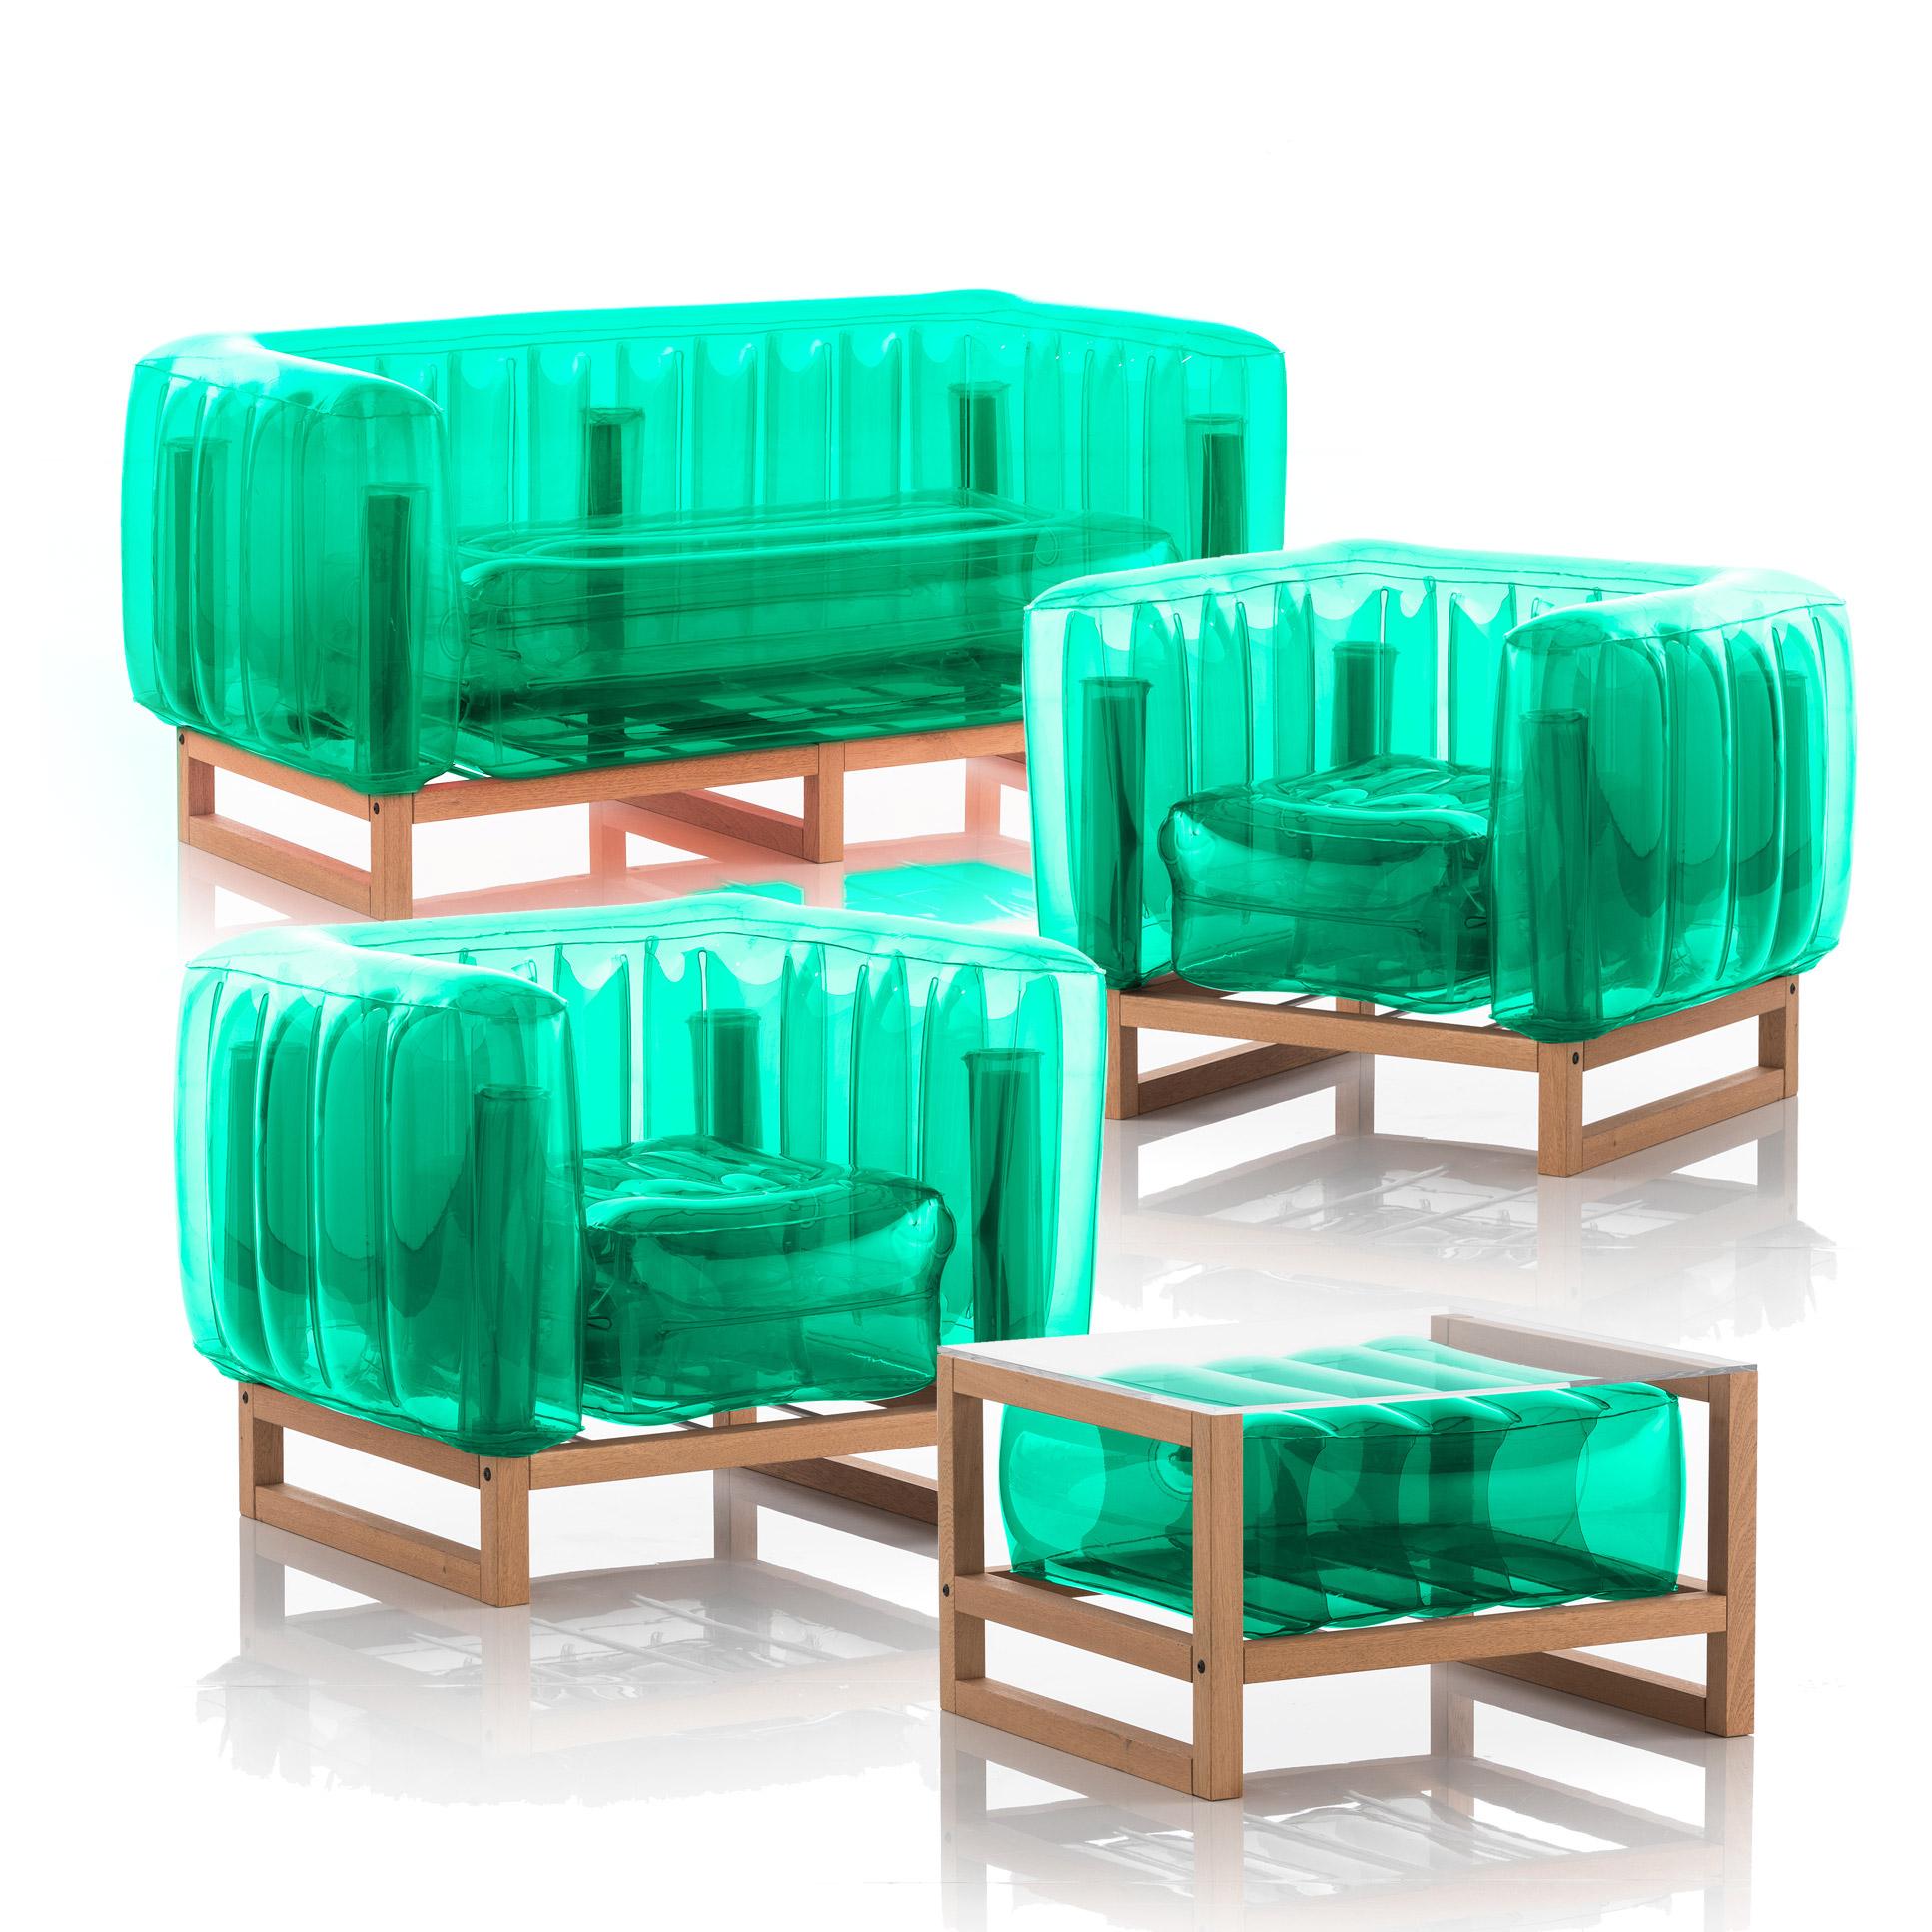 Salon de jardin design 1 canapé, 2 fauteuils et table basse vert